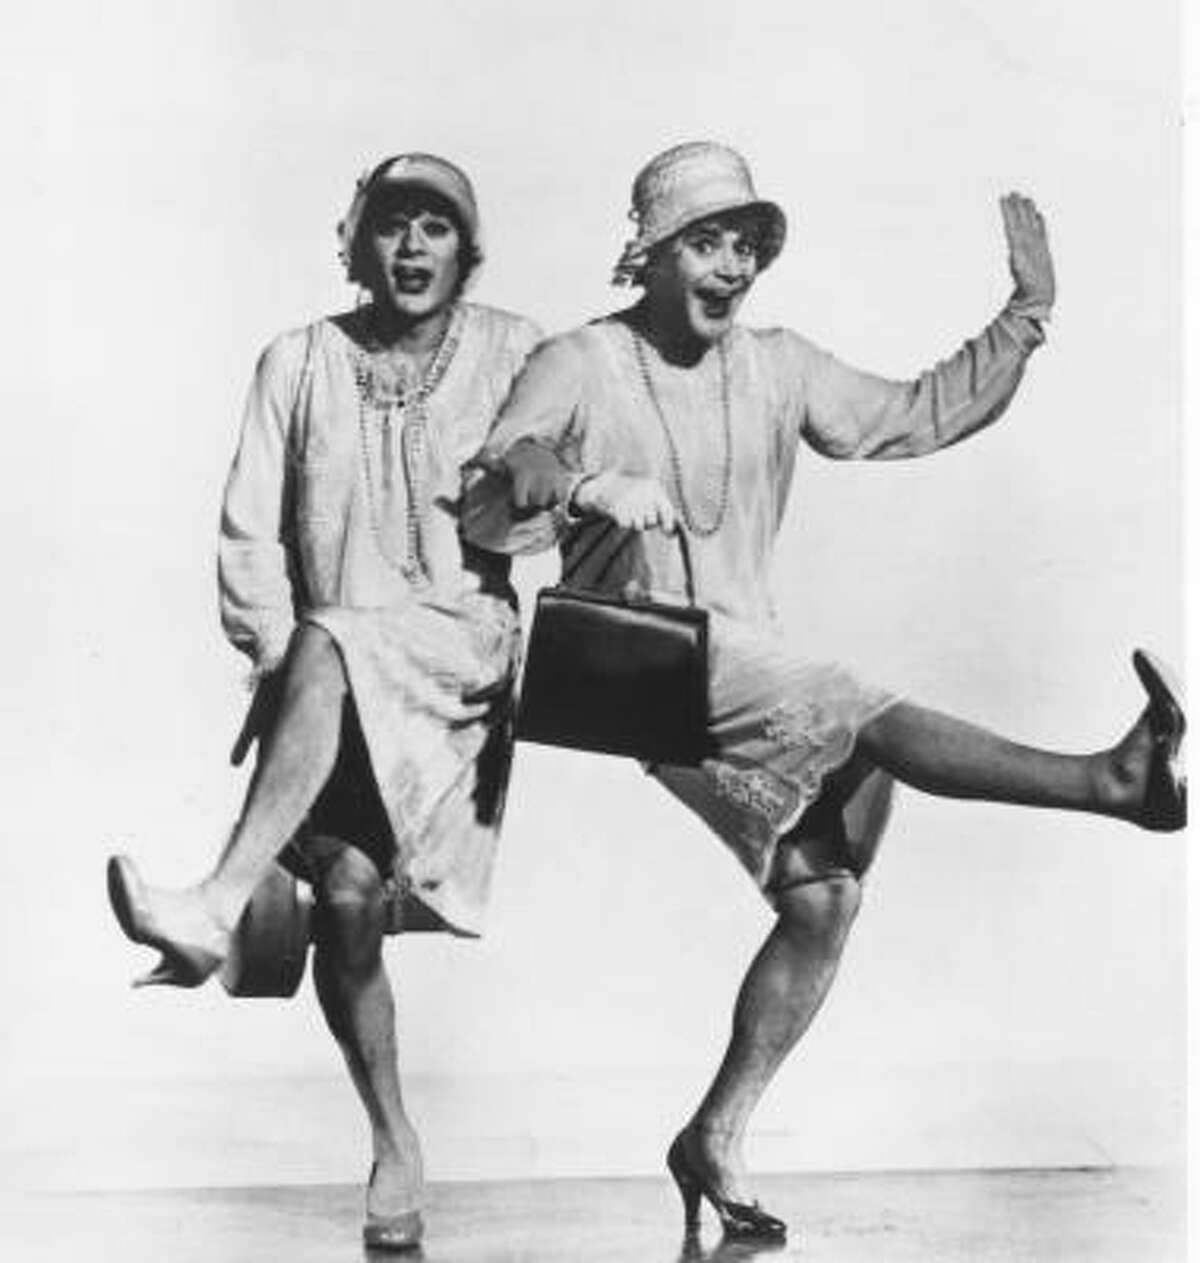 Tony Curtis (left) and Jack Lemmon star alongside Marilyn Monroe in the 1959 film,